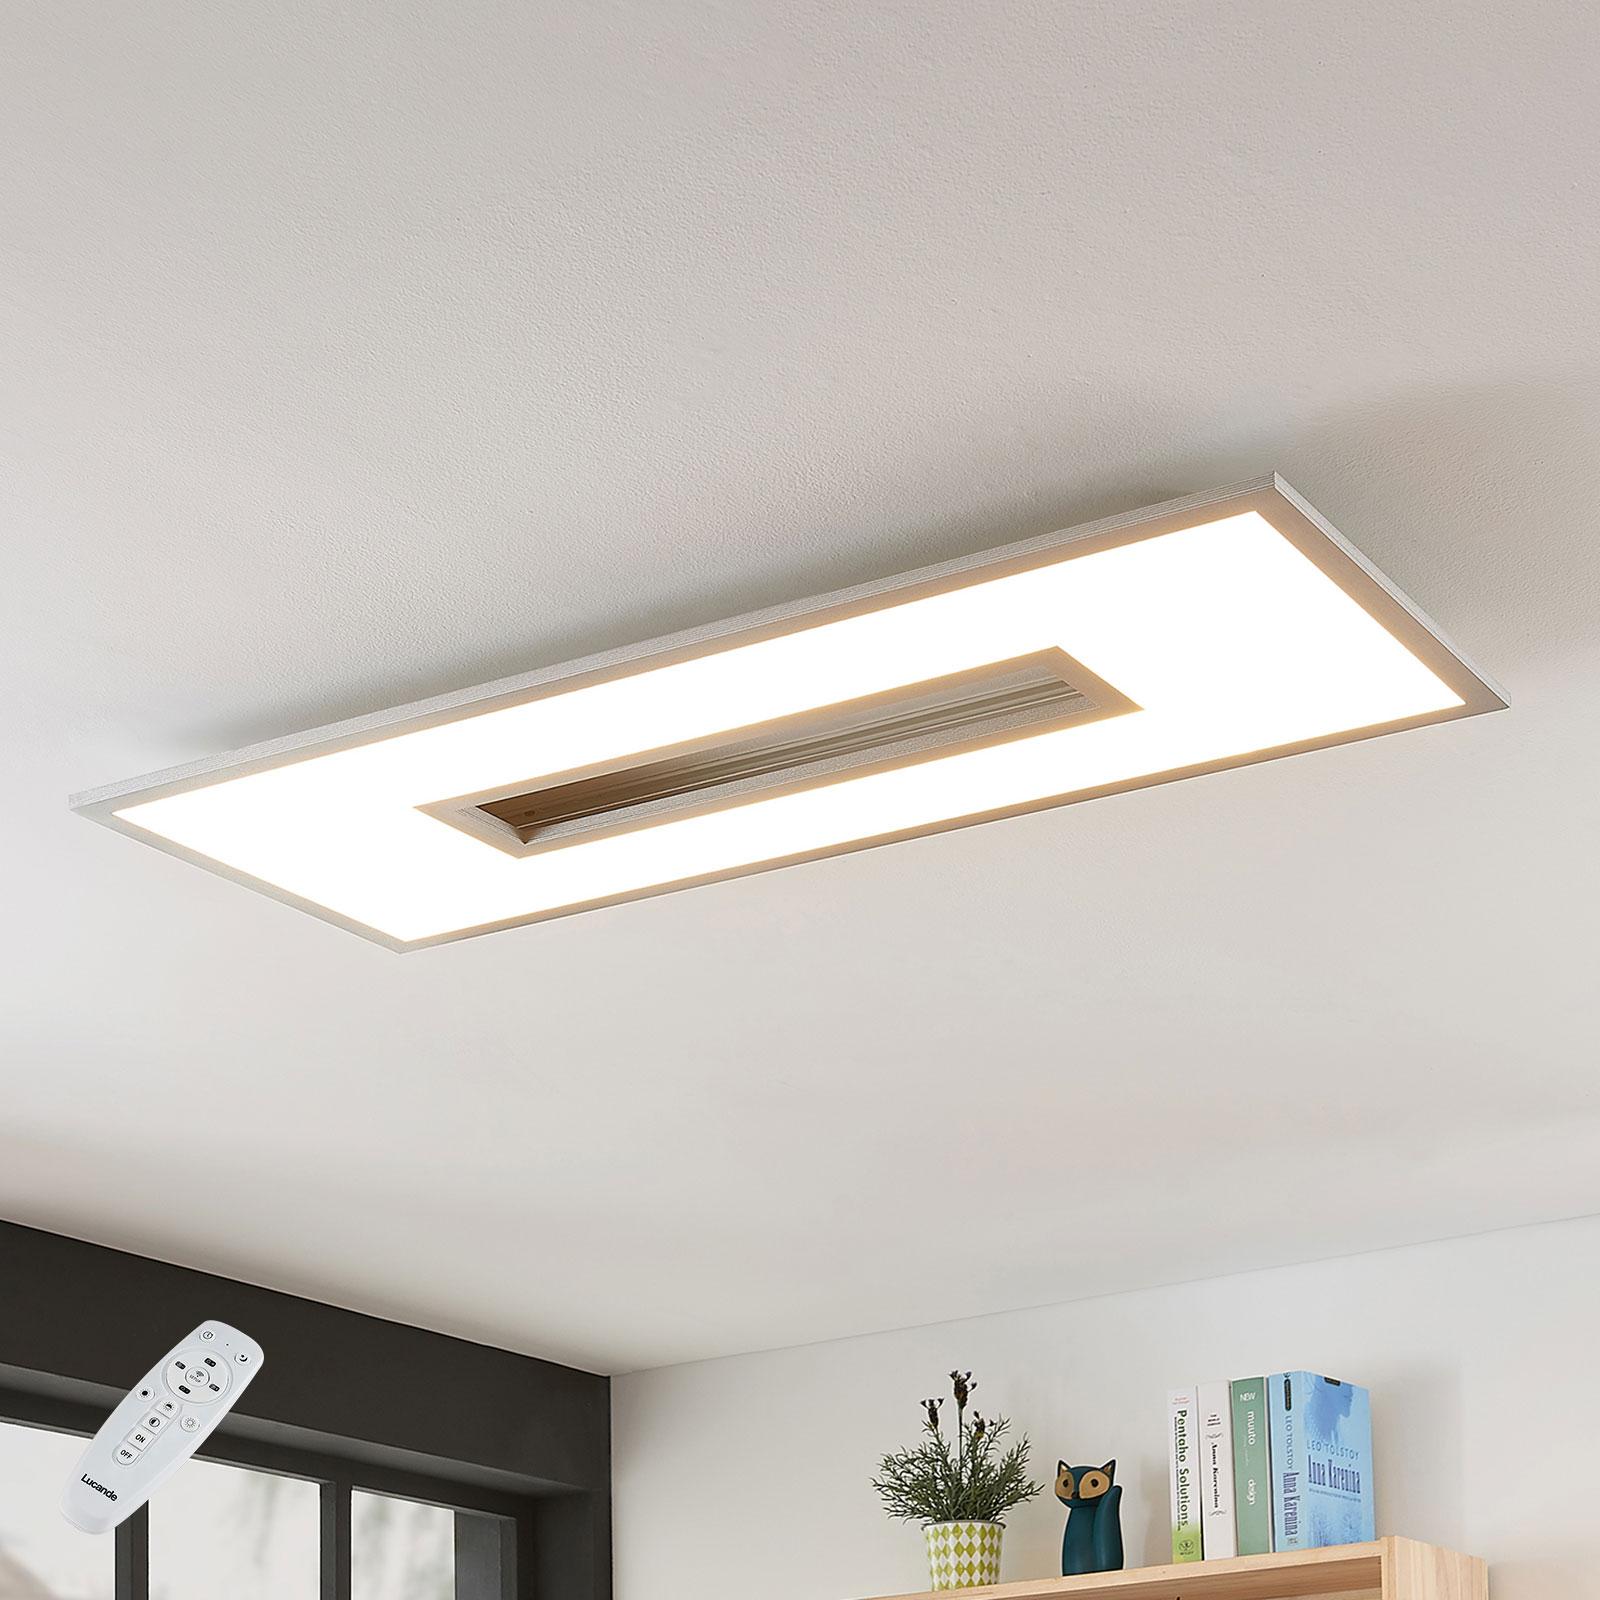 LED-Deckenlampe Durun, dimmbar, CCT, eckig, 96 cm